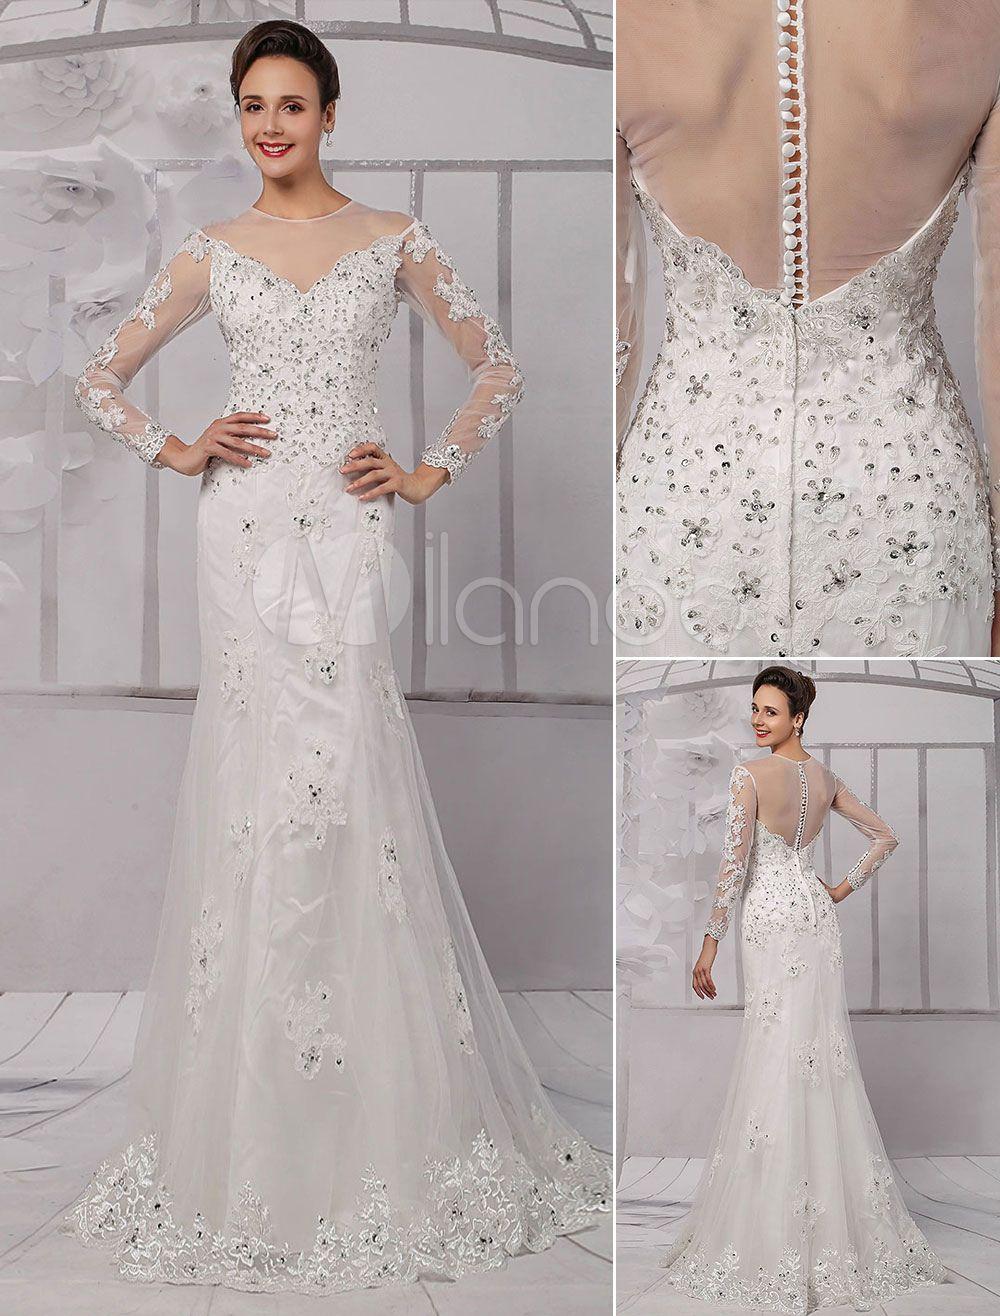 Lace illusion neckline longsleeves kneelength sheath wedding dress